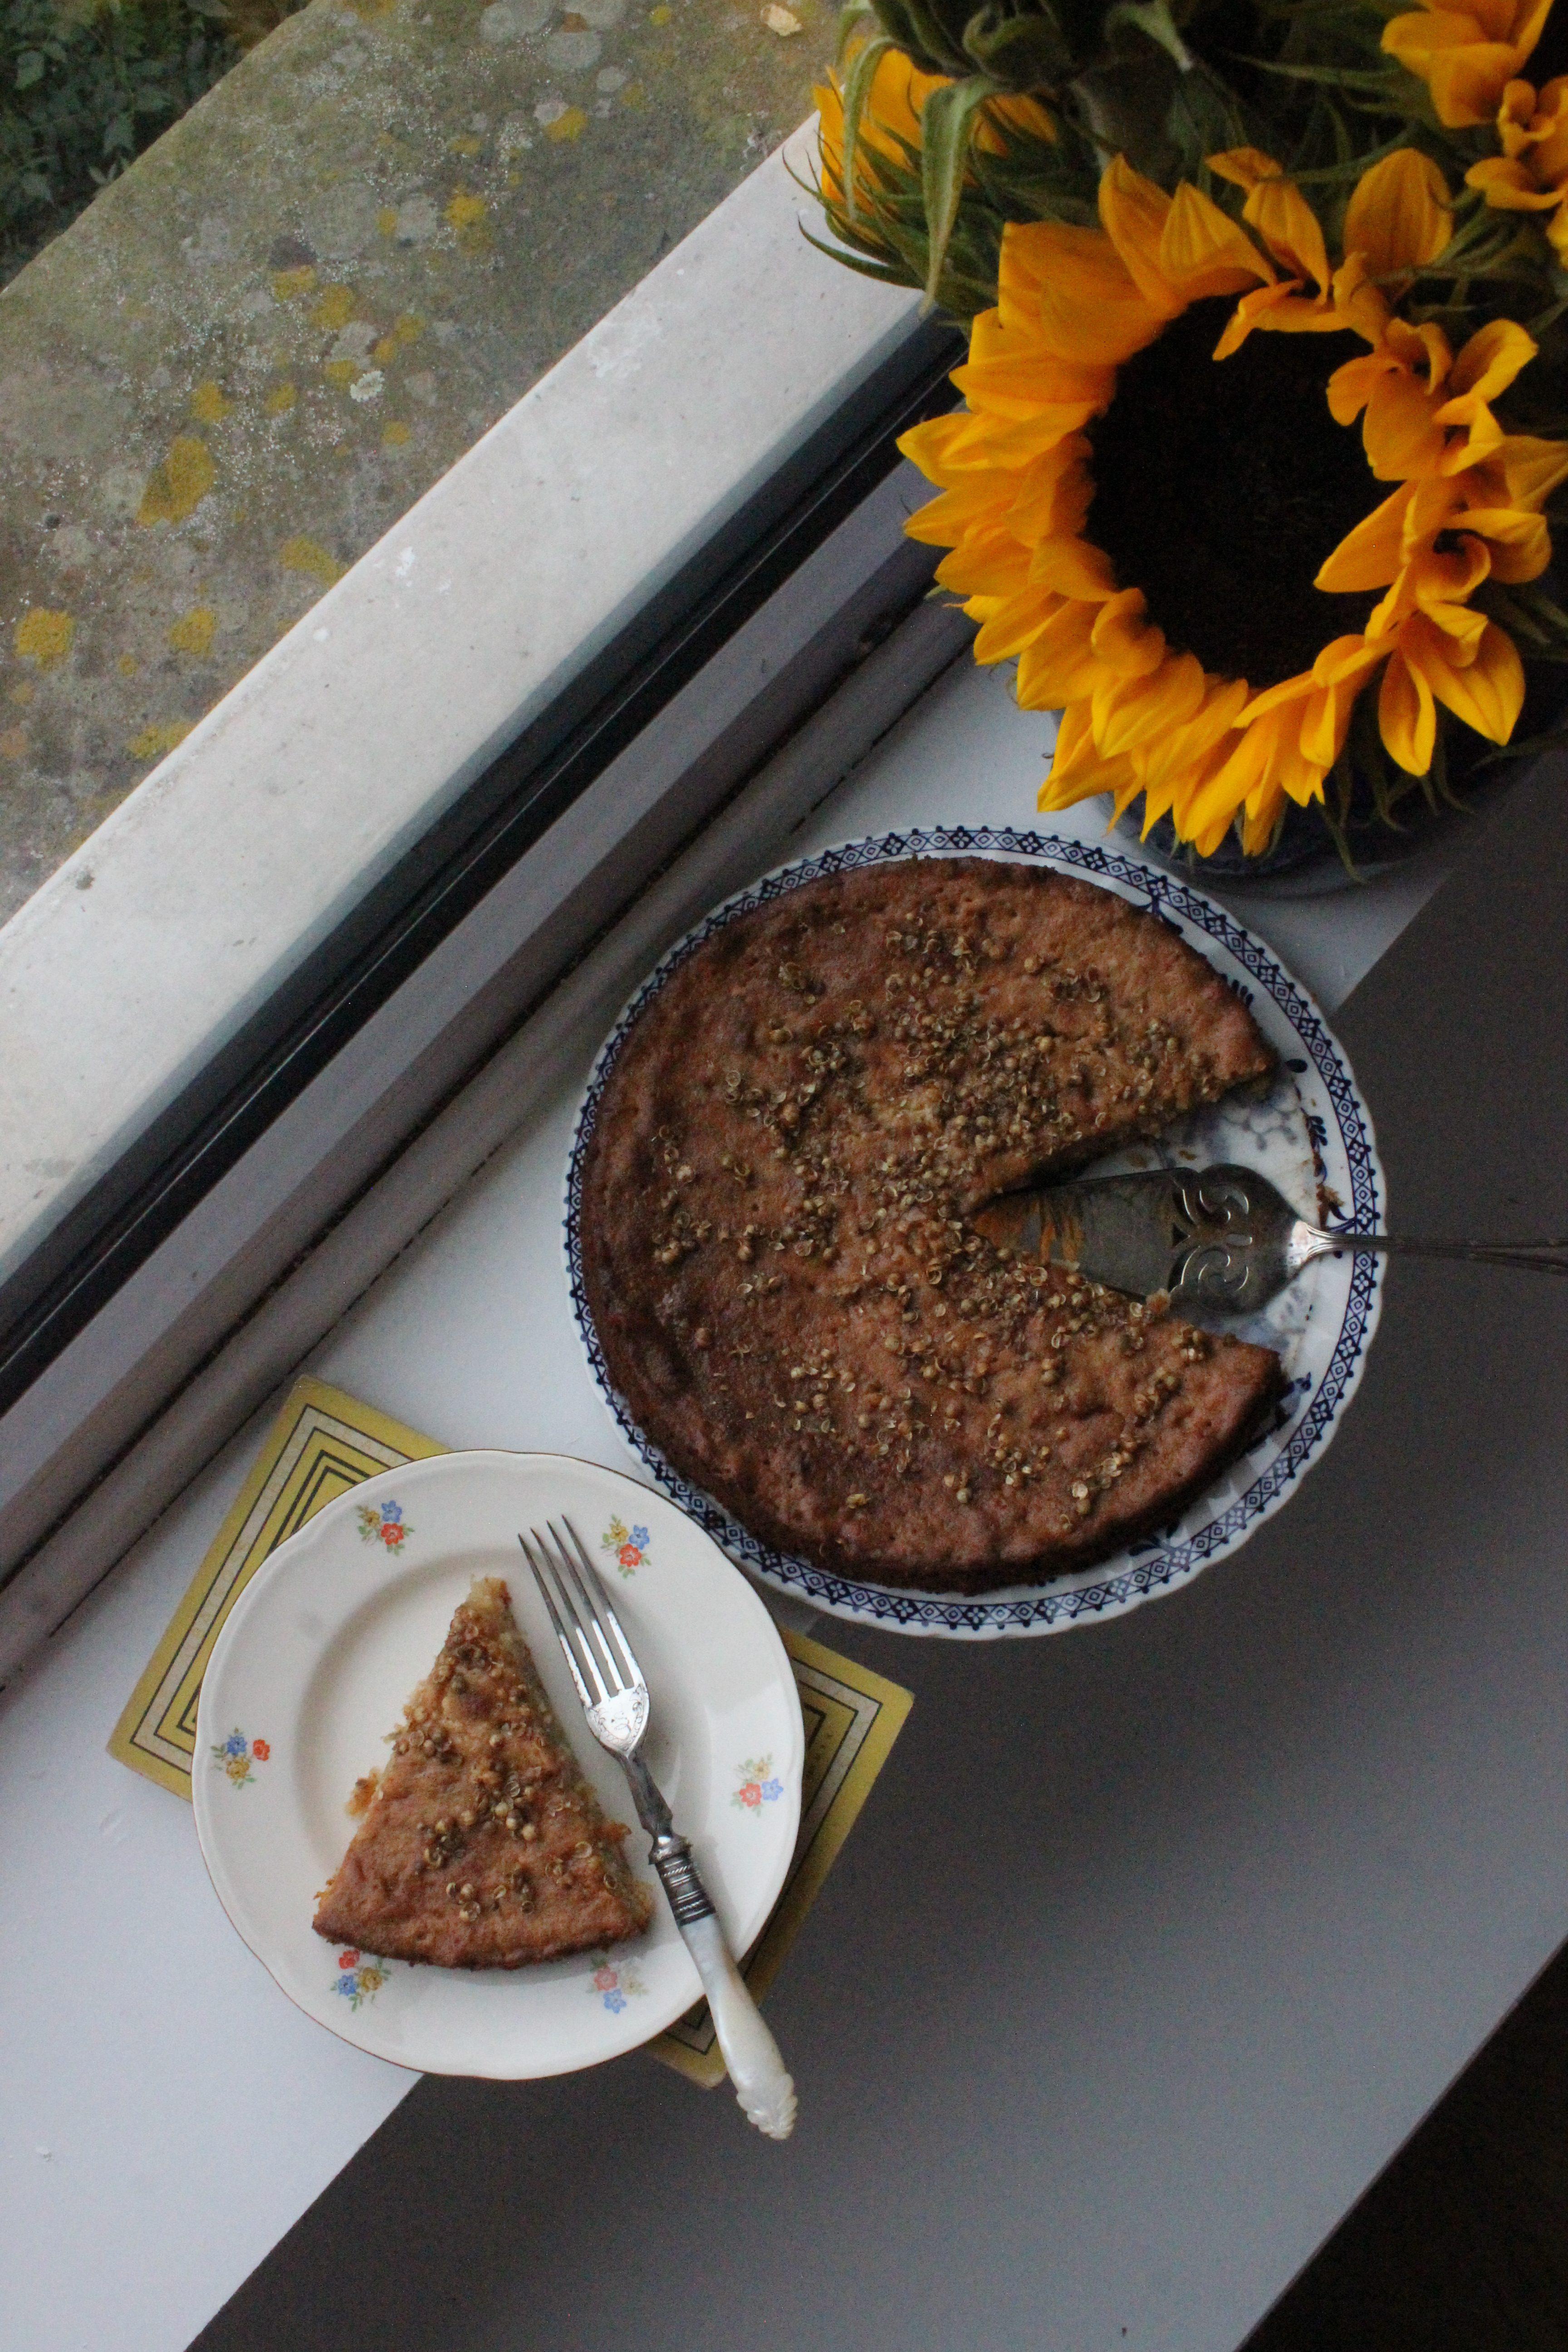 Honey Cake with Lemon and Coriander Seed